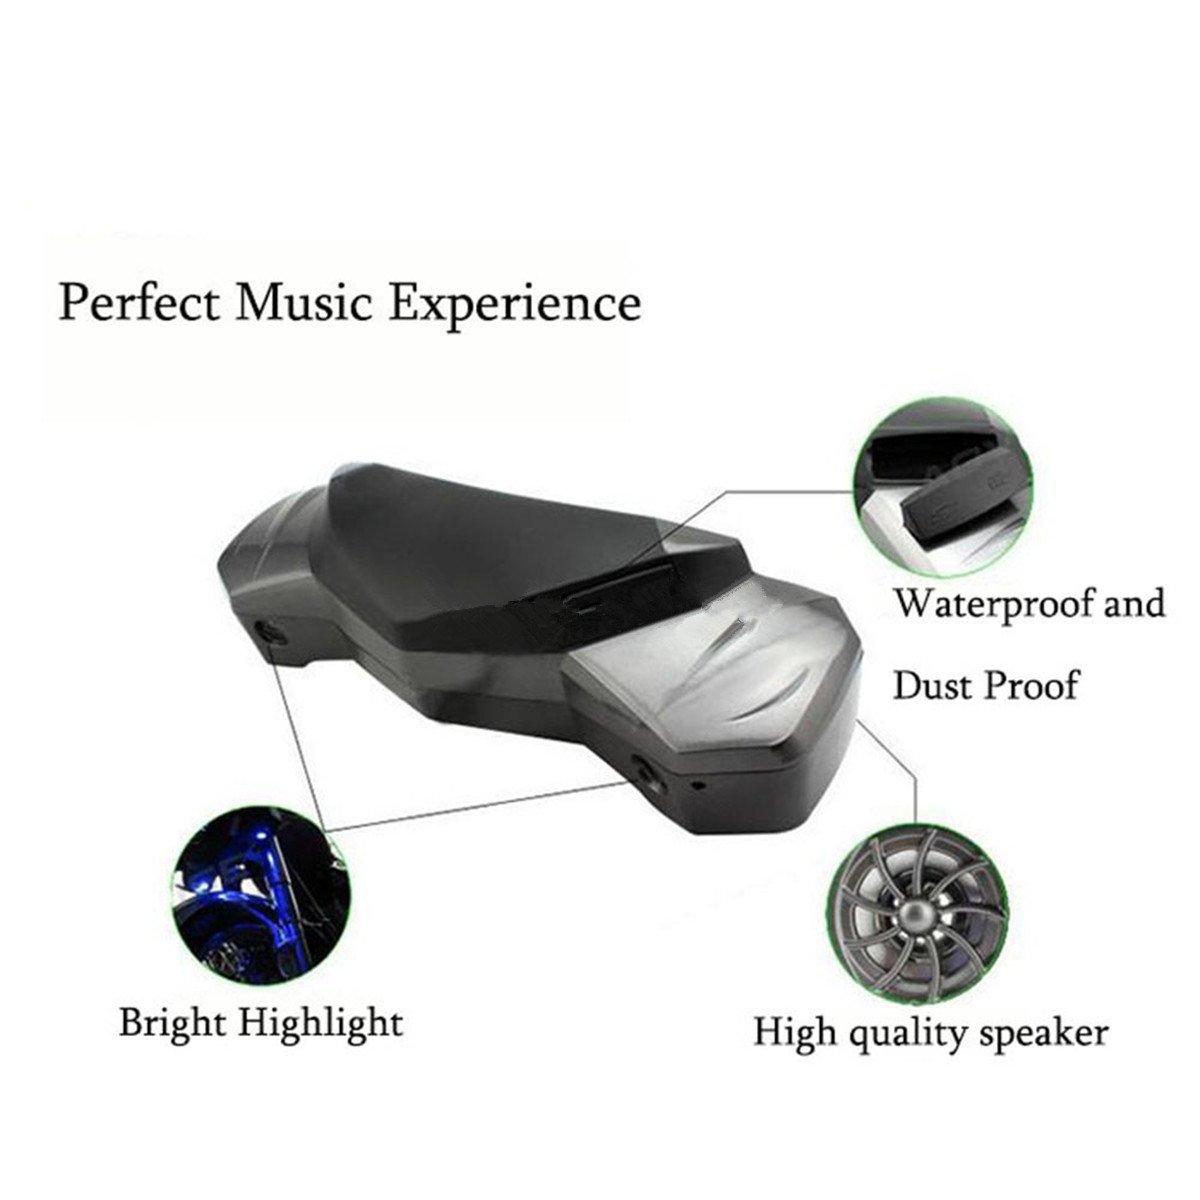 Fochutech Bluetooth Speaker For Honda Series Motorcycle Accessory Spotlight Wiring Diagram Tf Usb Mp3 Fm Radio Player Waterproof 12v Car Electronics